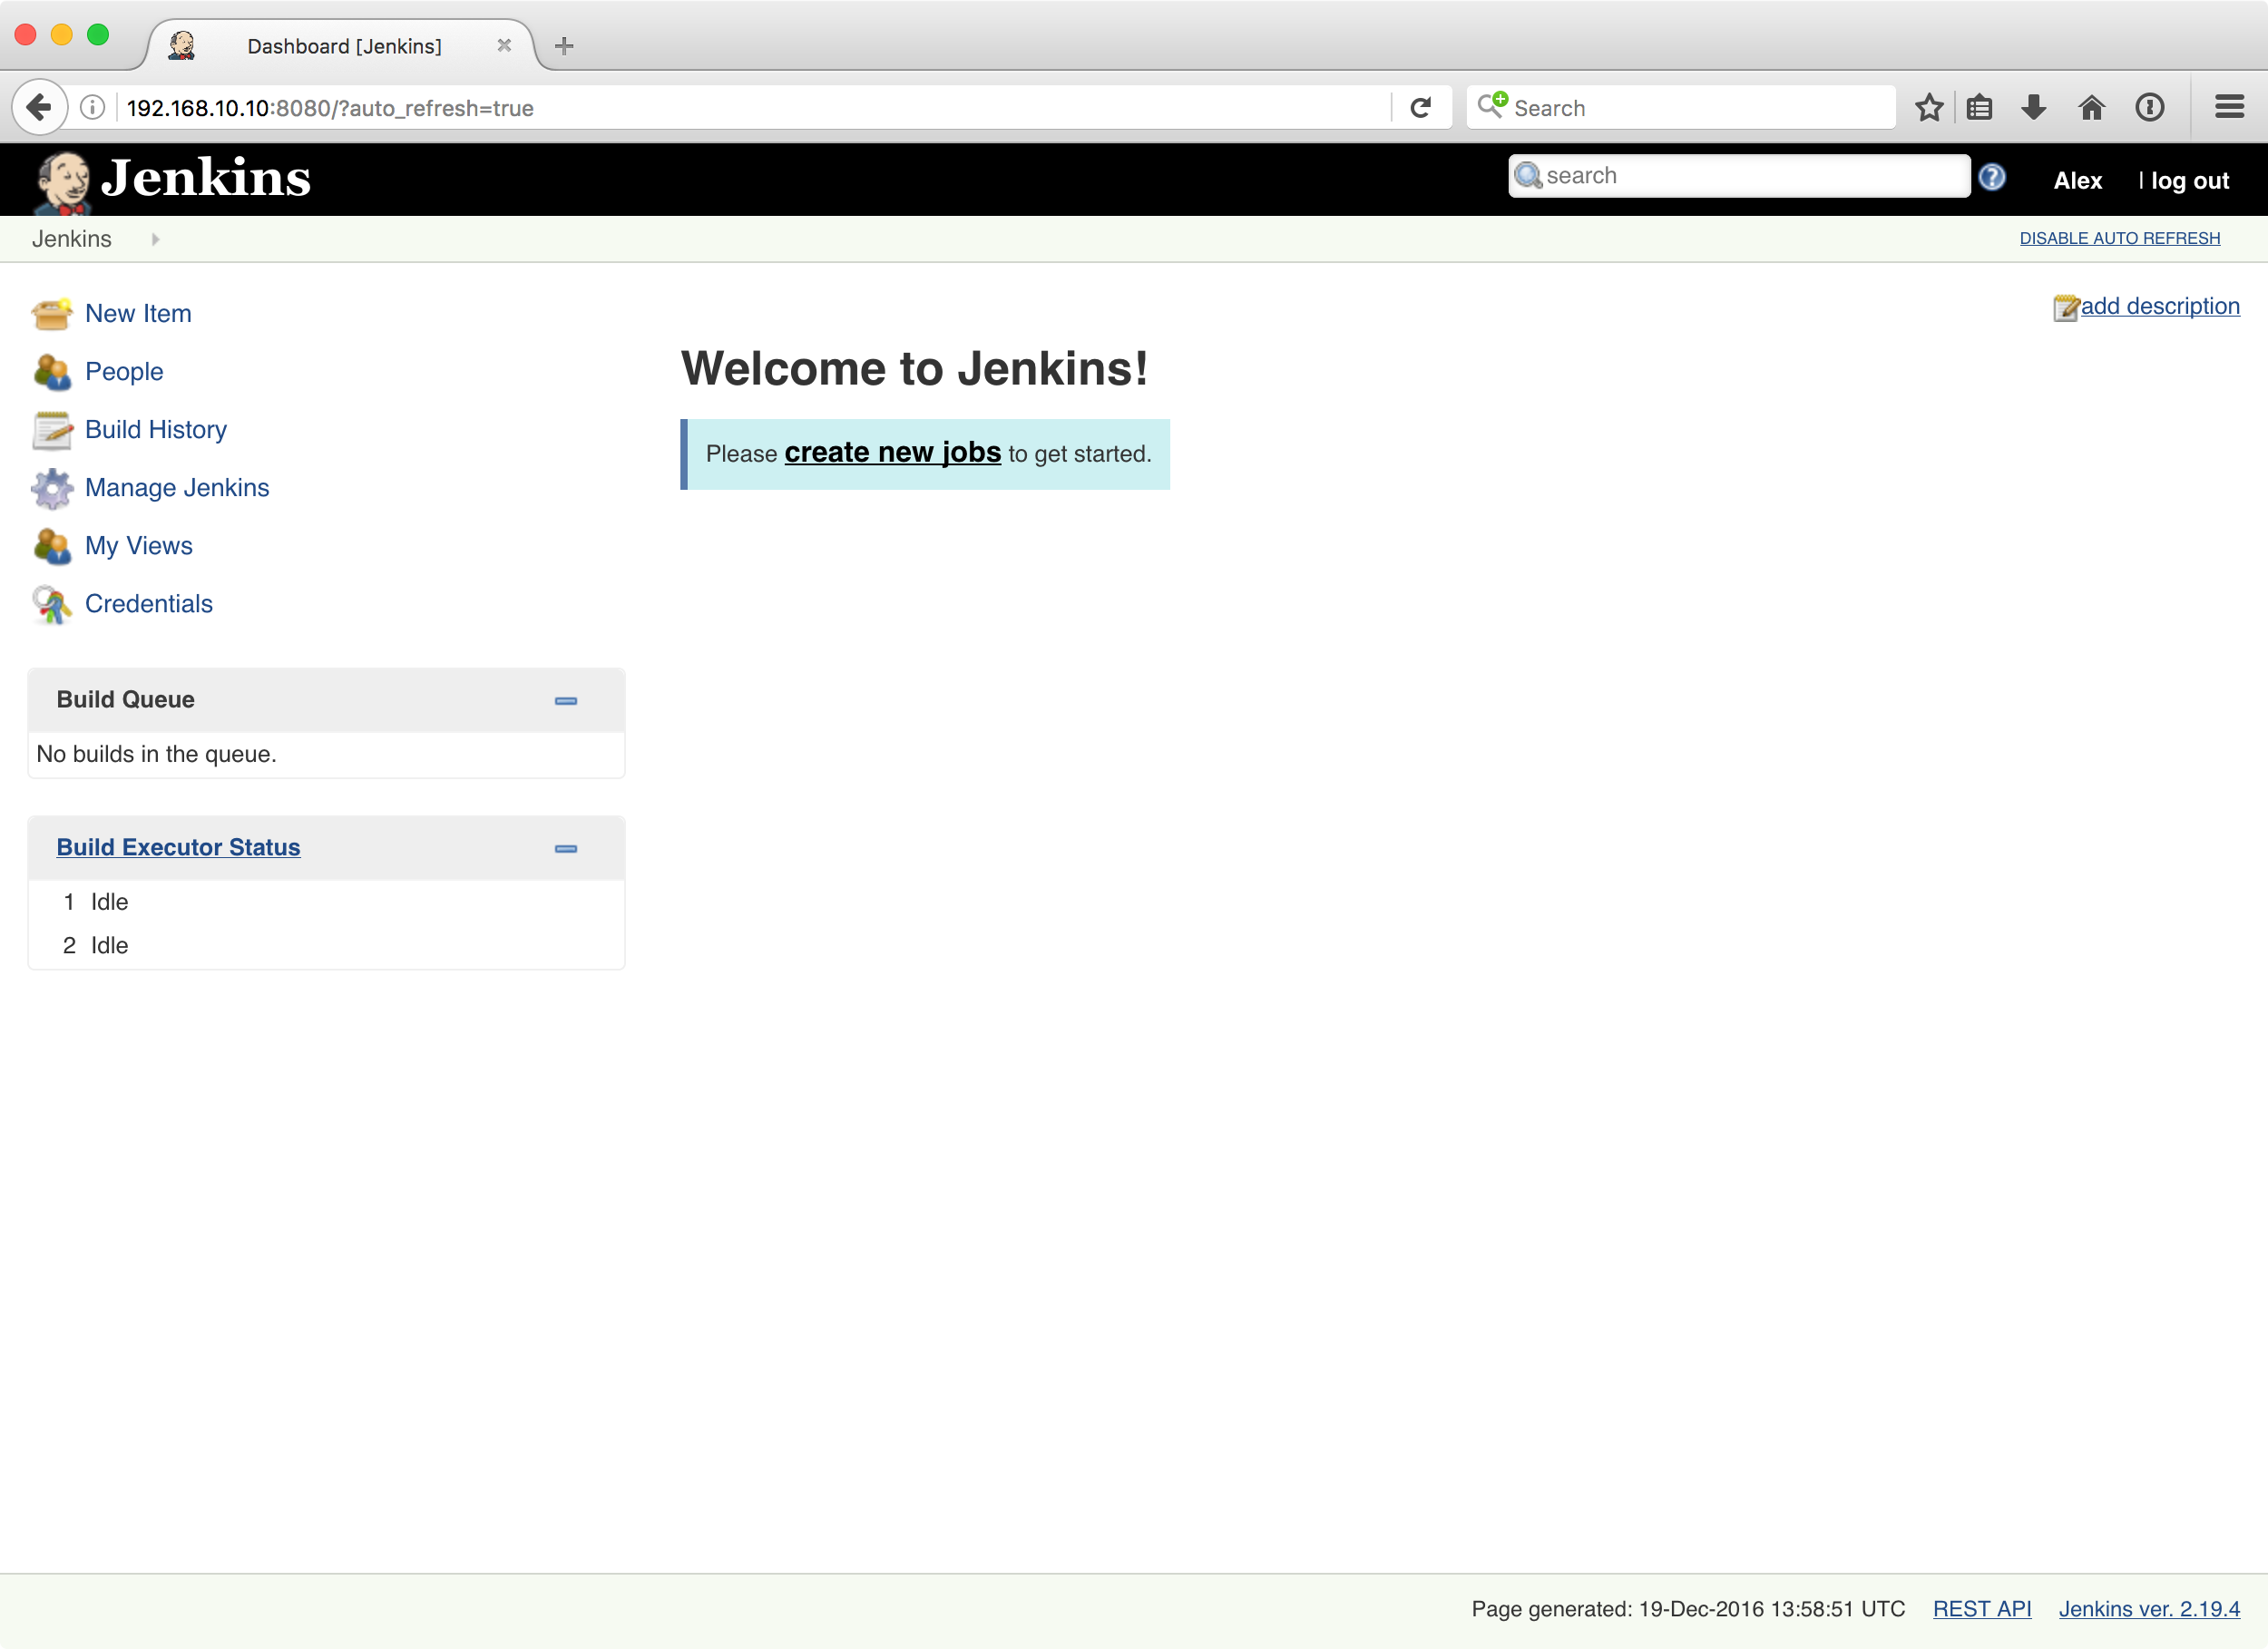 jenkins-dashboard.png